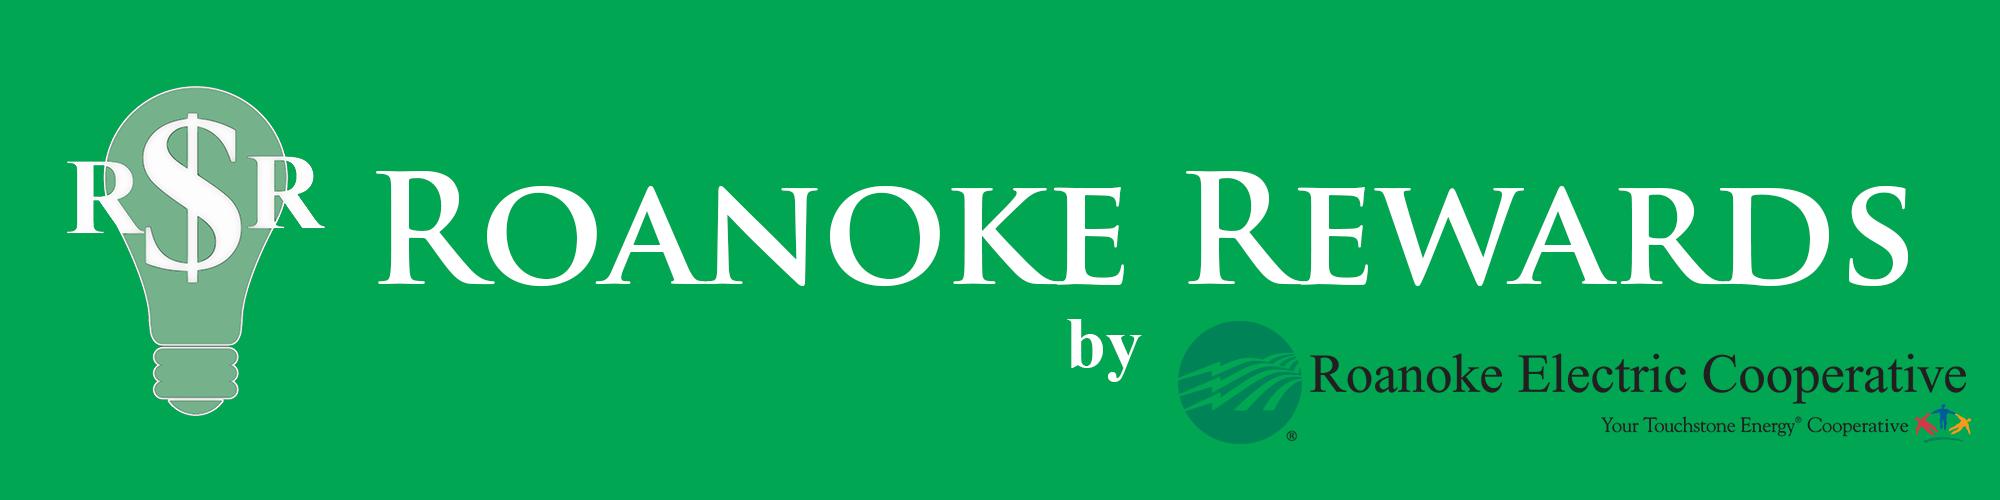 Roanoke rewards logo 2